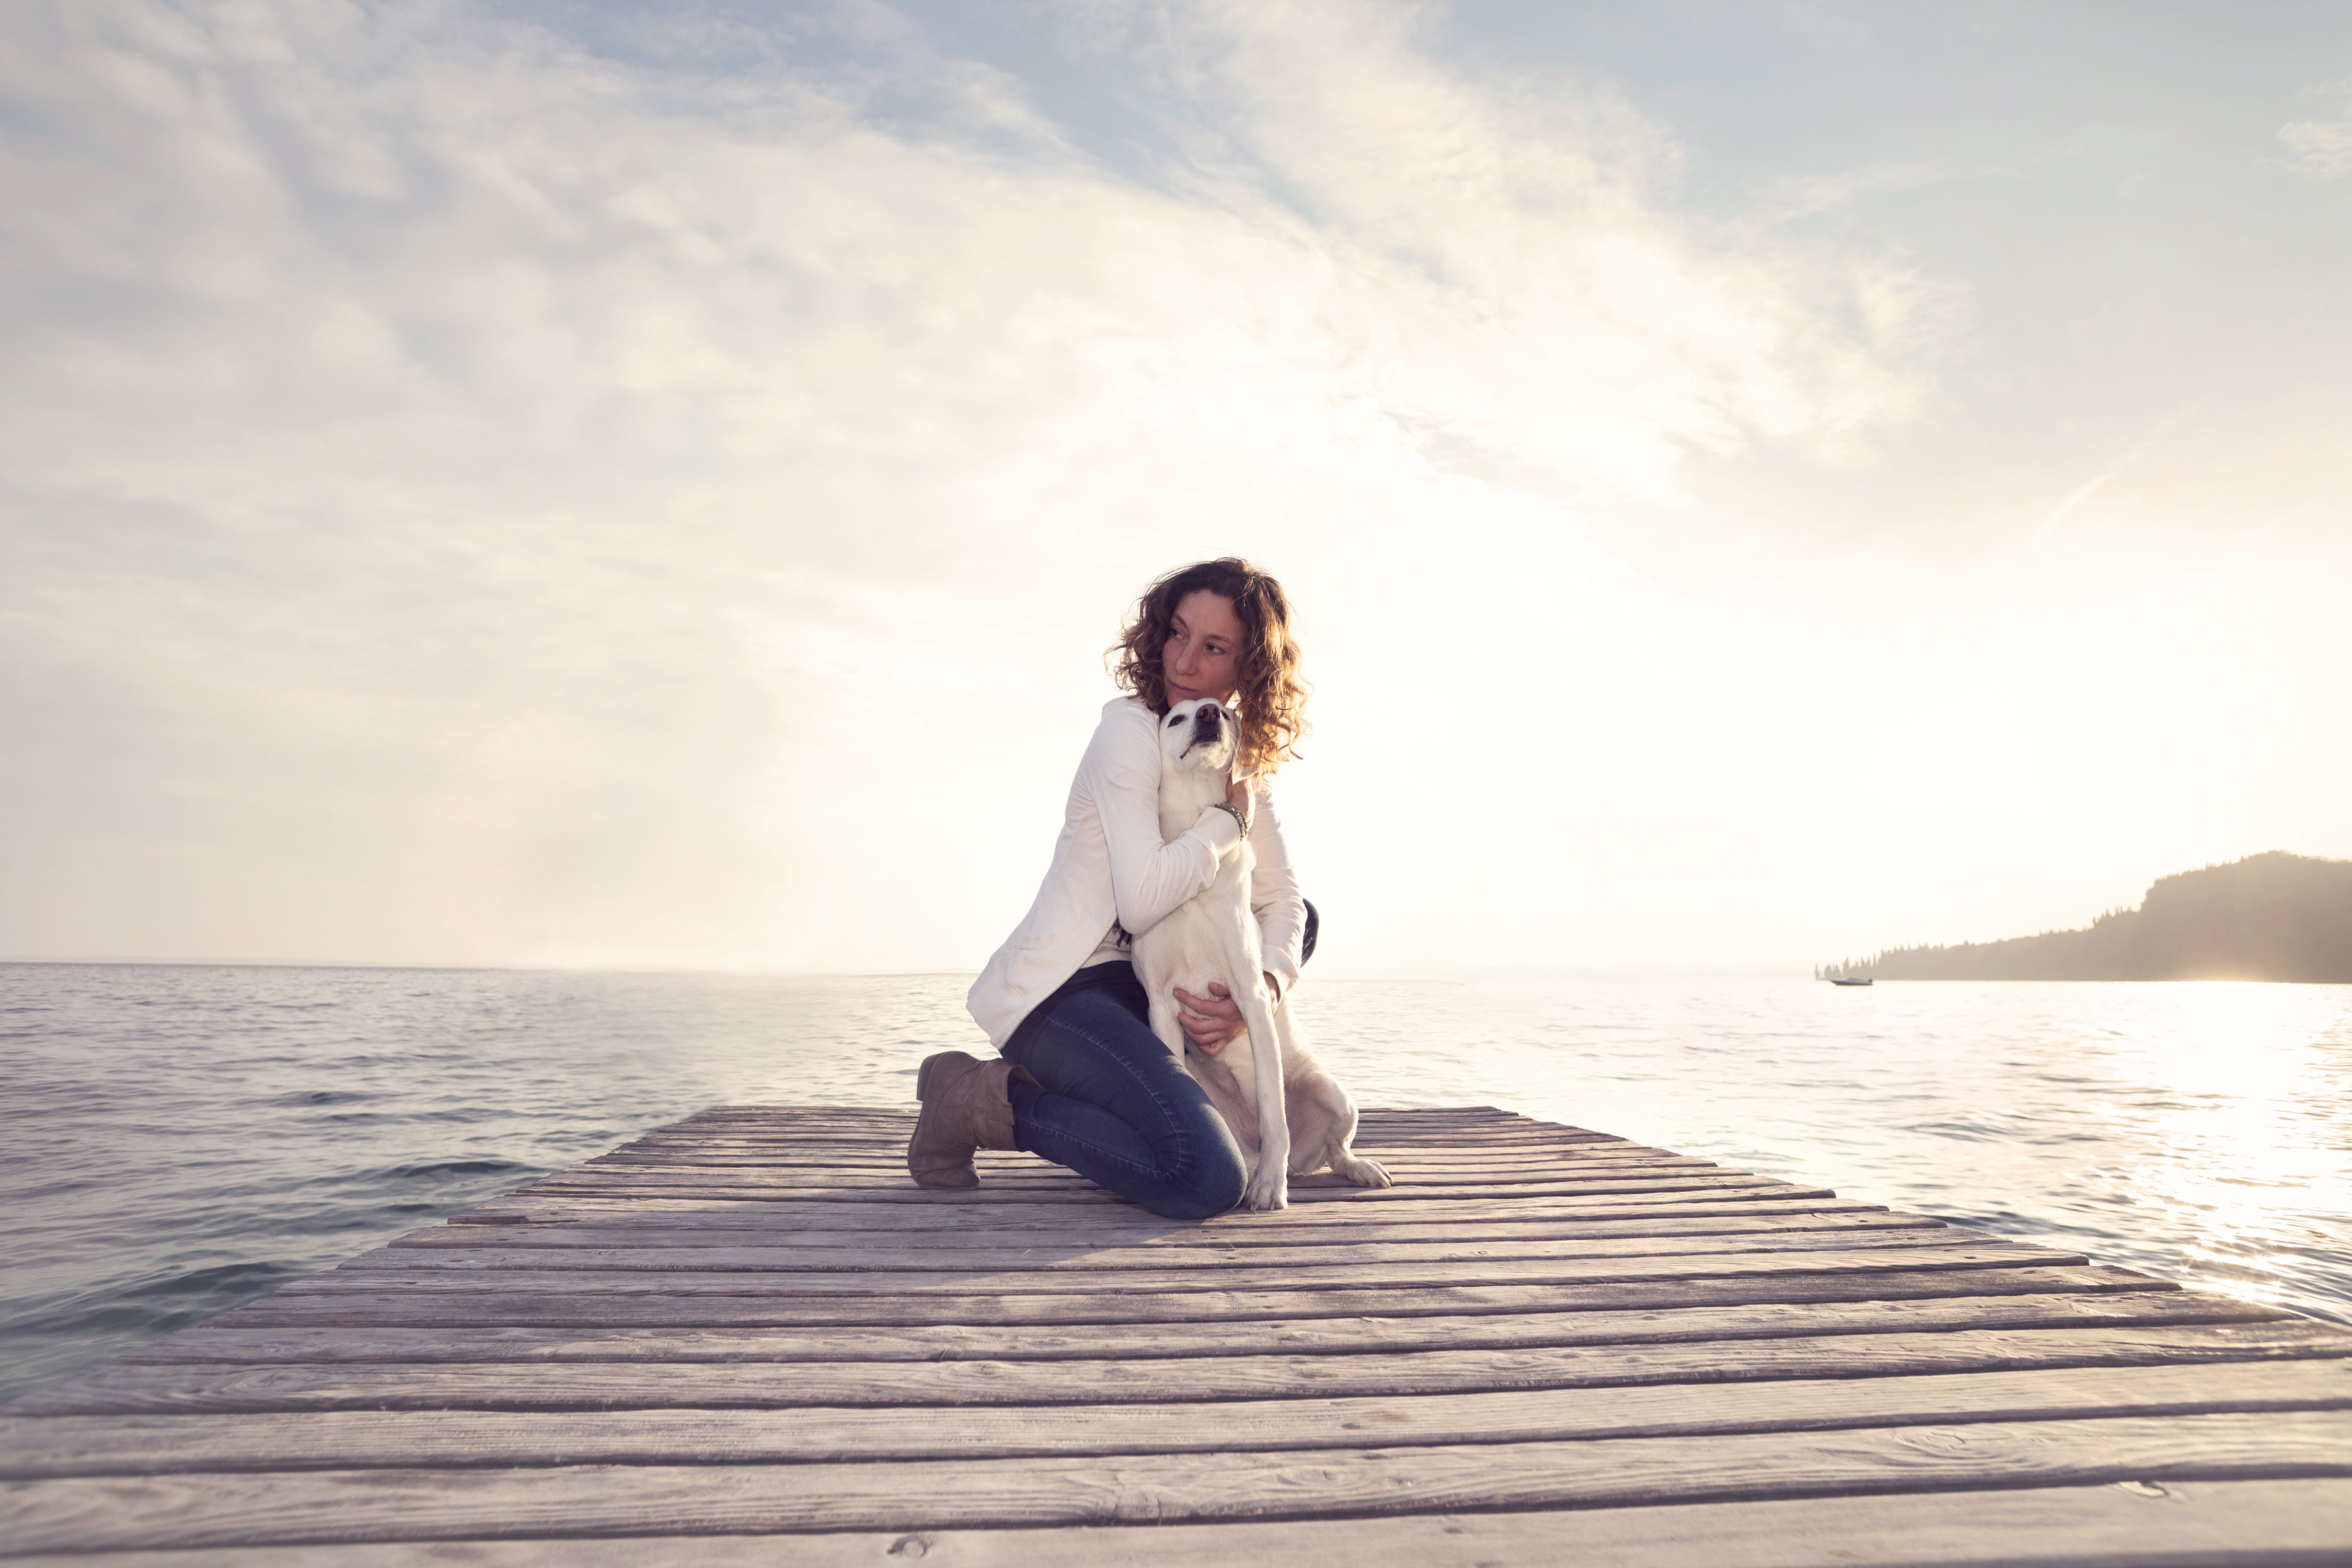 Frau umarmt Hund auf Steg zum Meer